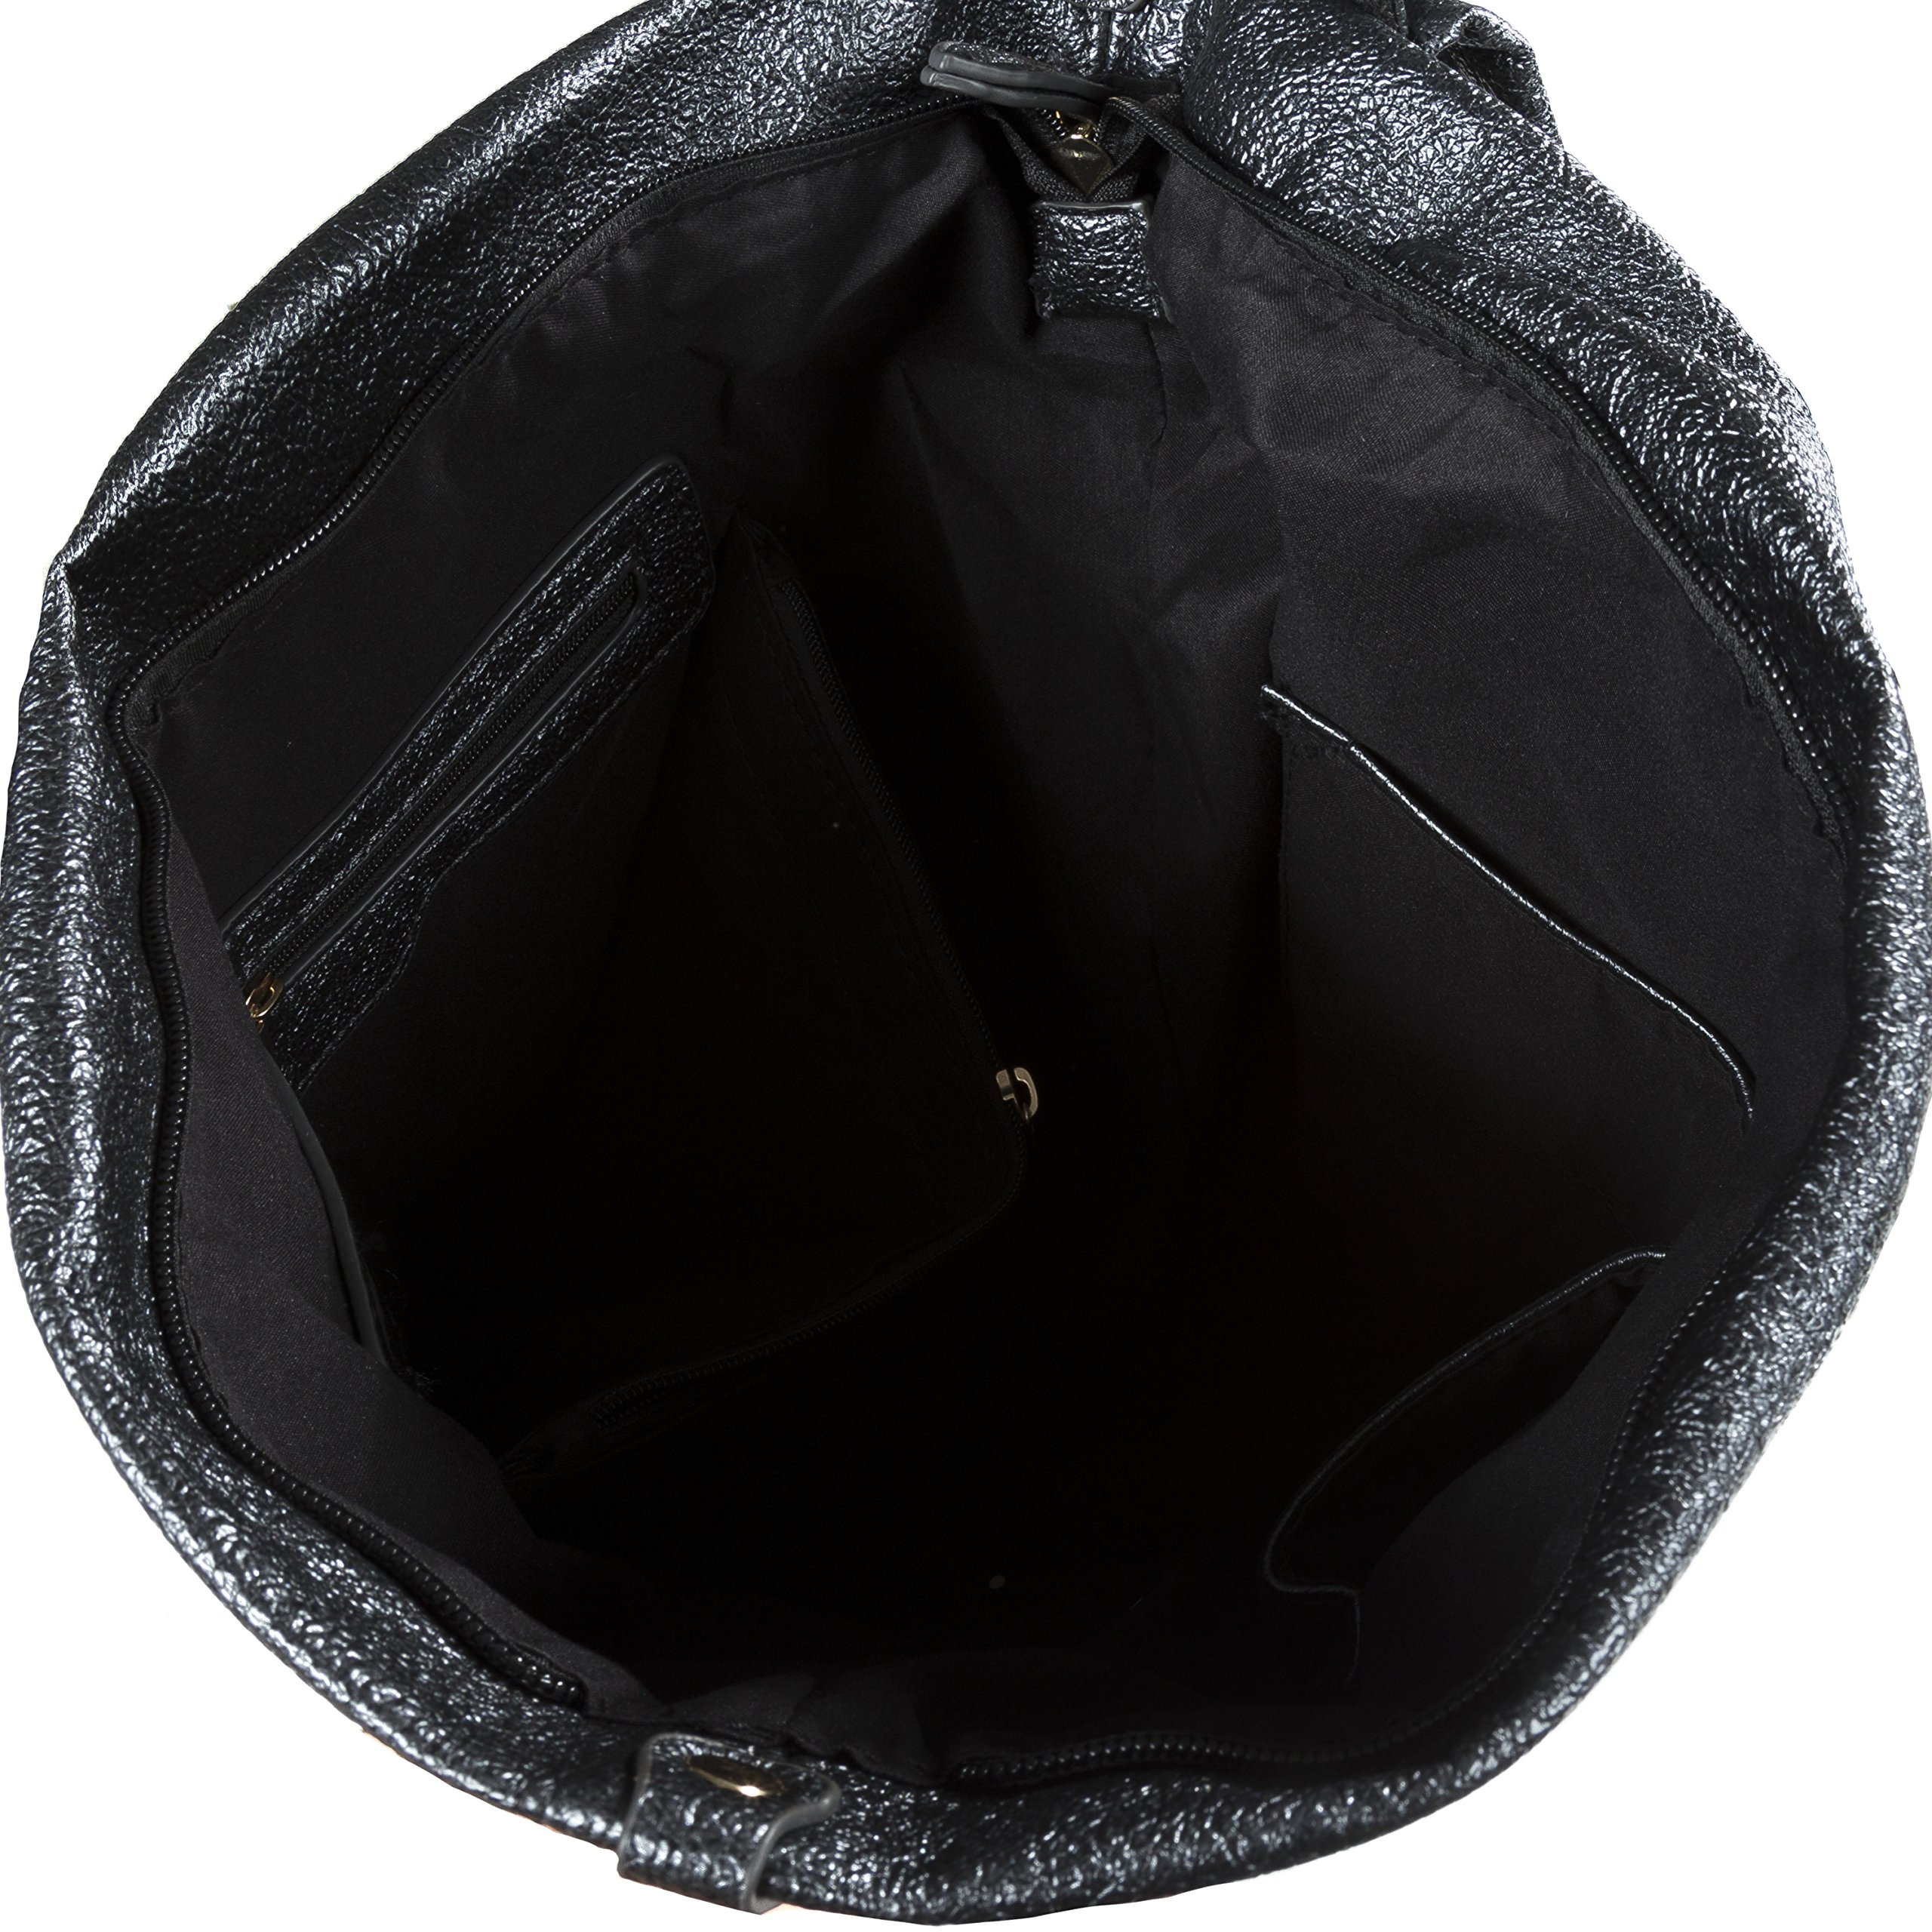 Handbag Republic Fashion Backpack Vegan Leather Travel Bag Easy Carry For Women by Handbag Republic (Image #5)